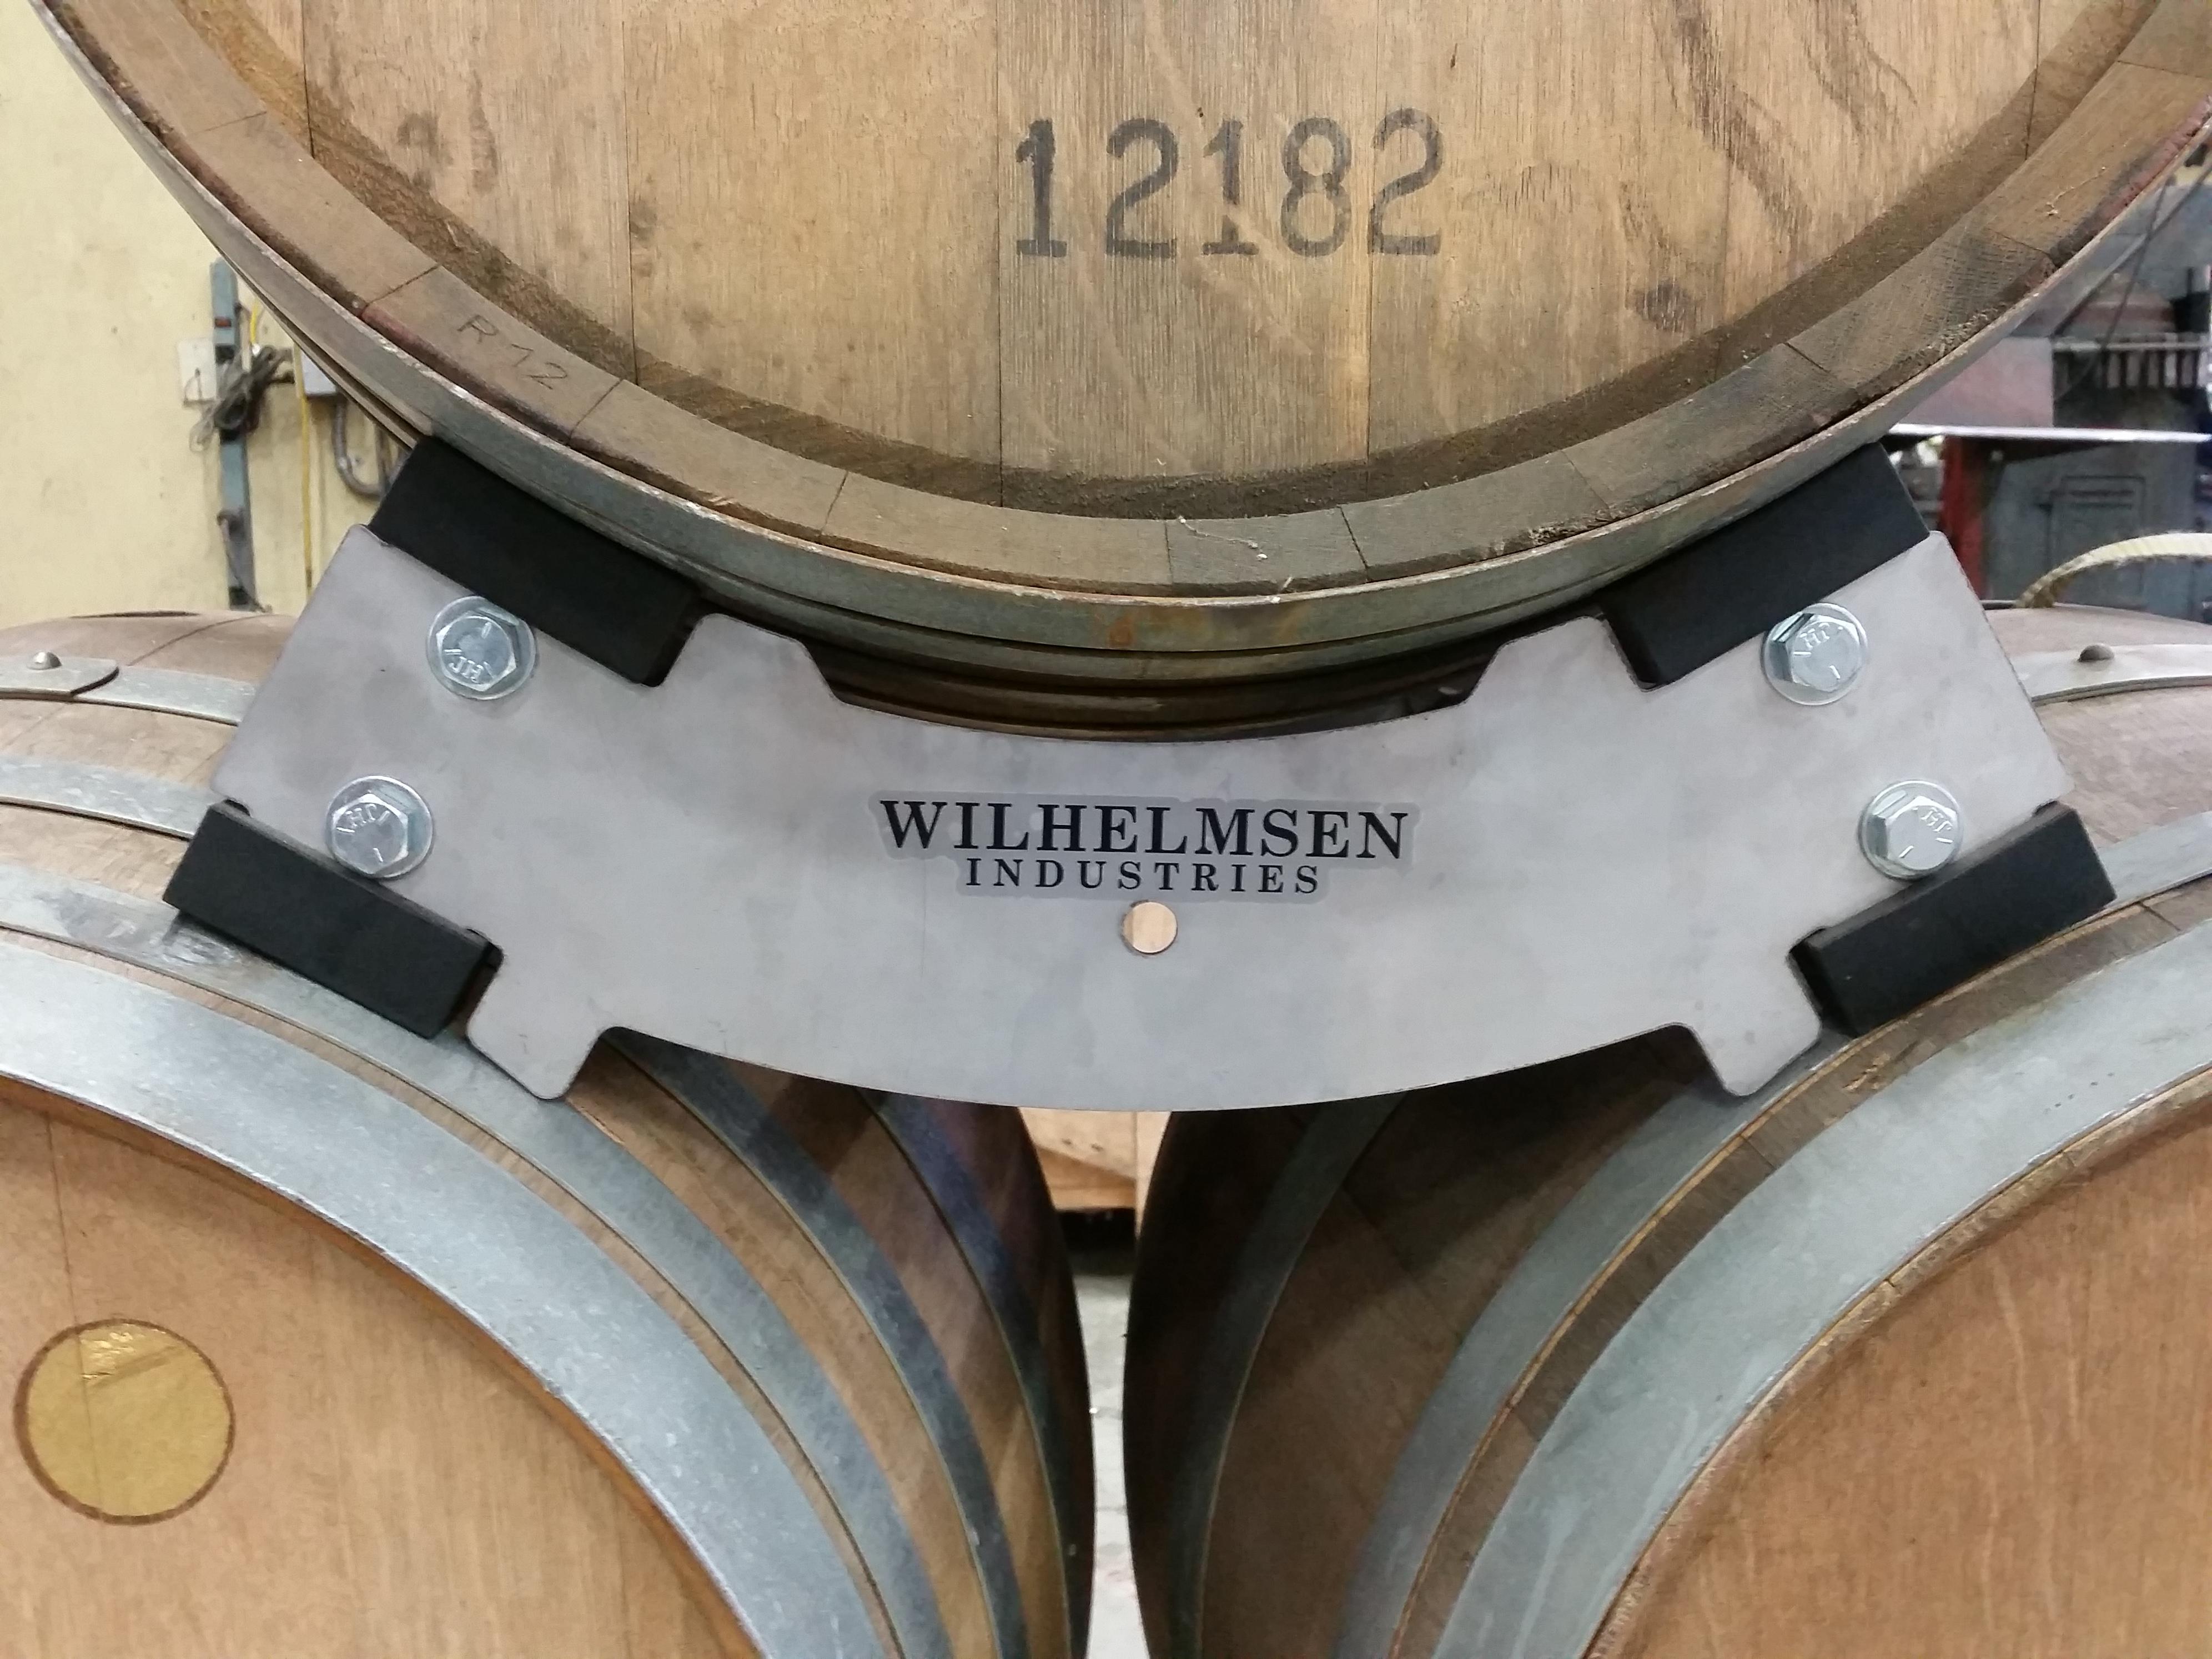 Profile: Wilhelmsen Industries, LLC - Wines Vines Analytics